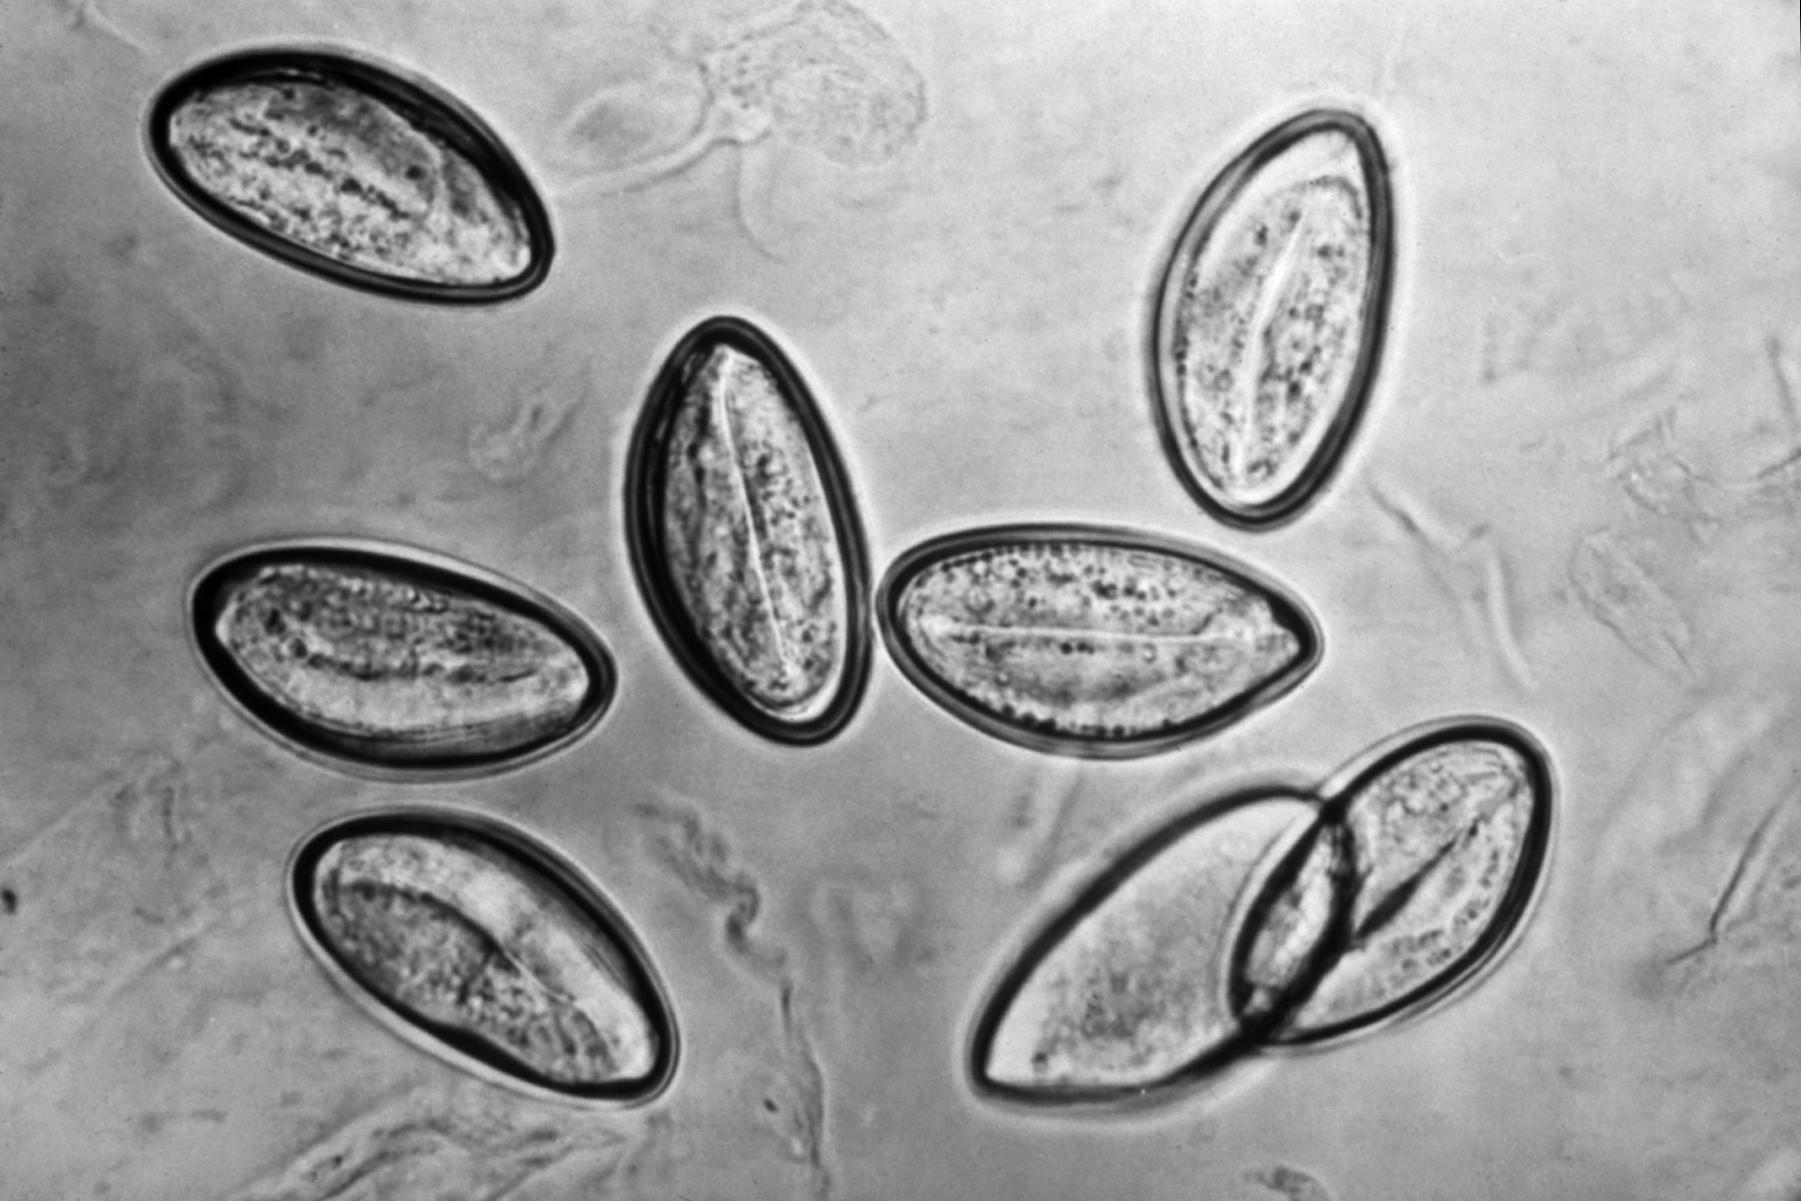 enterobius vermicularis egg size)